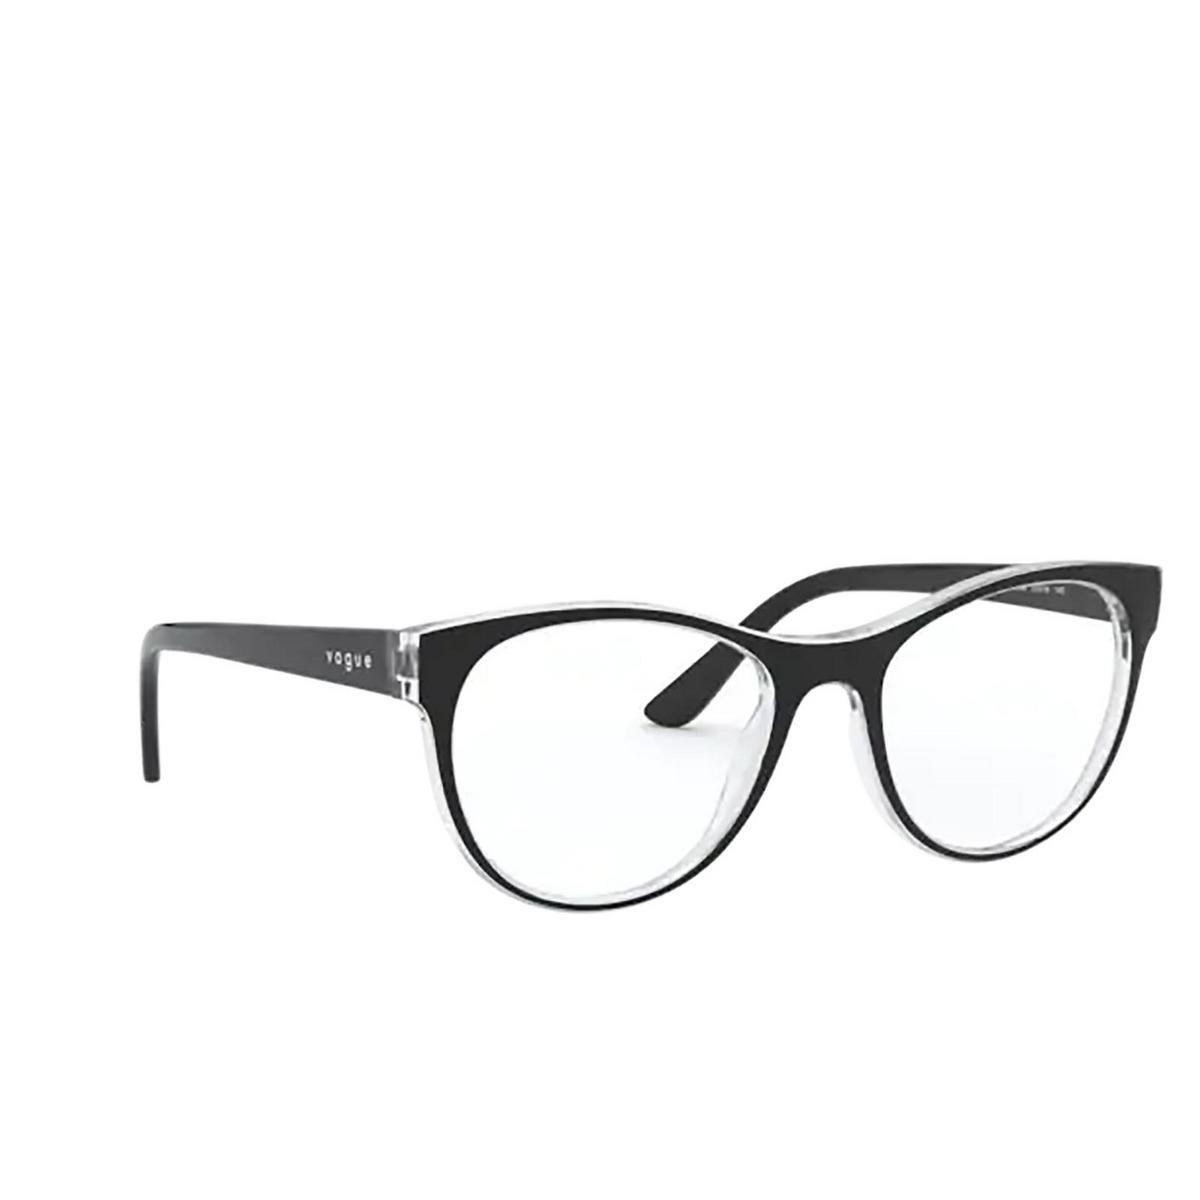 Vogue® Cat-eye Eyeglasses: VO5336 color Top Black / Serigraphy 2839.